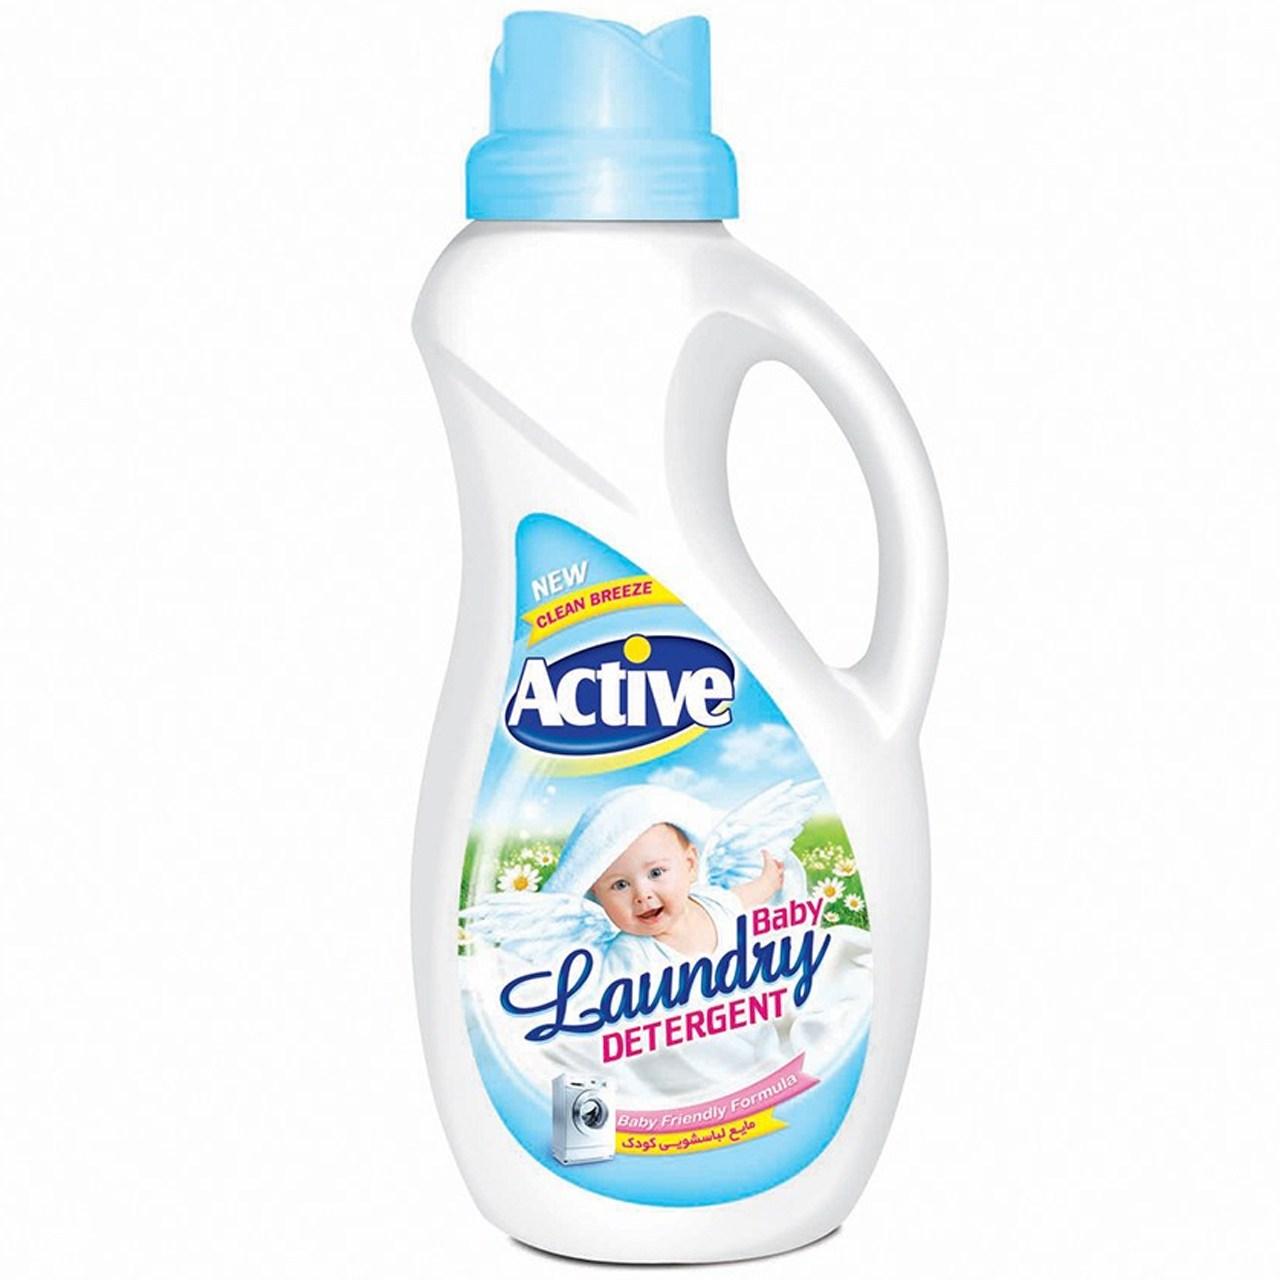 خرید                     مایع لباسشویی آبی اکتیو مخصوص کودک حجم 1500 میلی لیتر